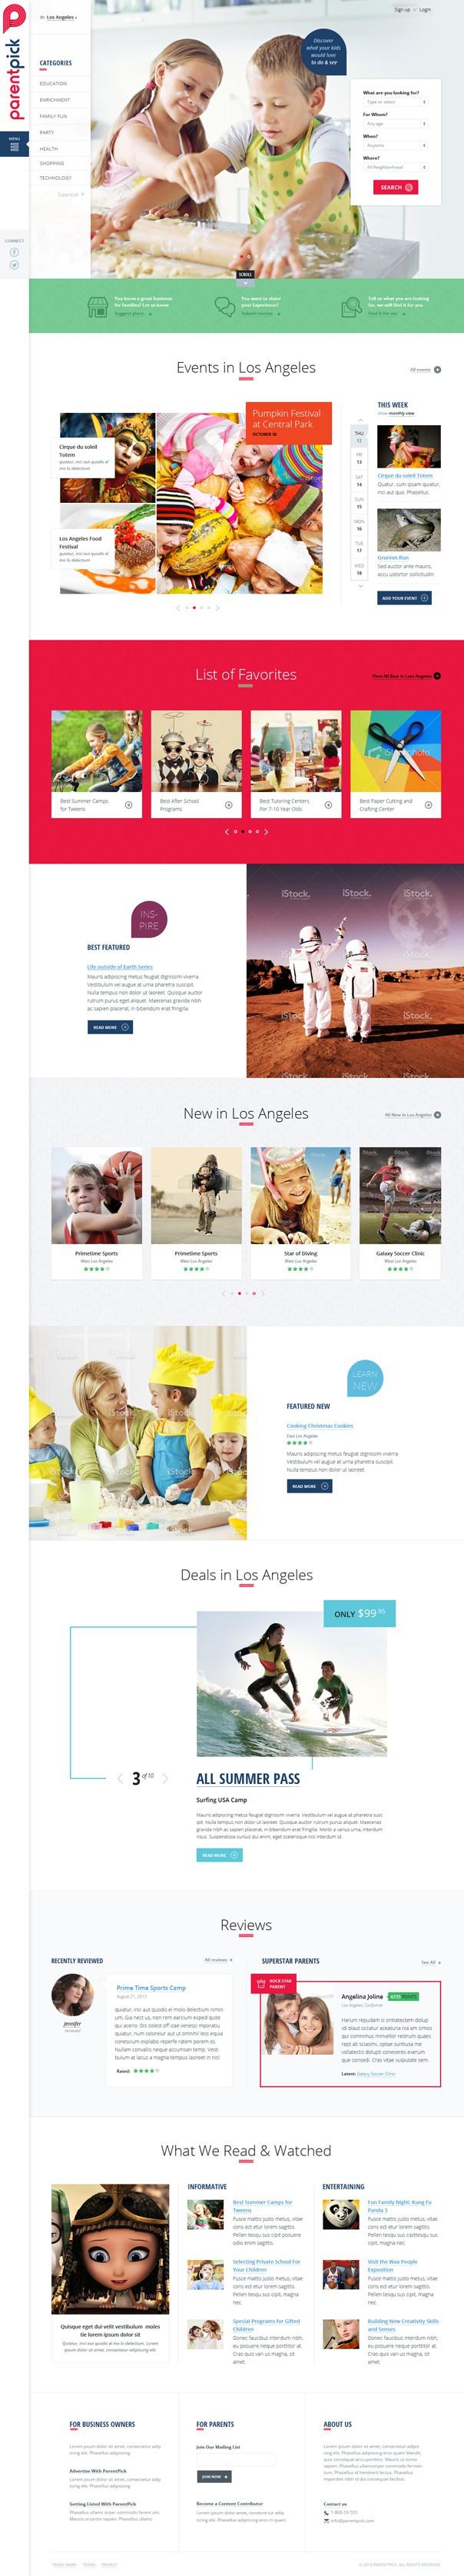 New Website Design for company.